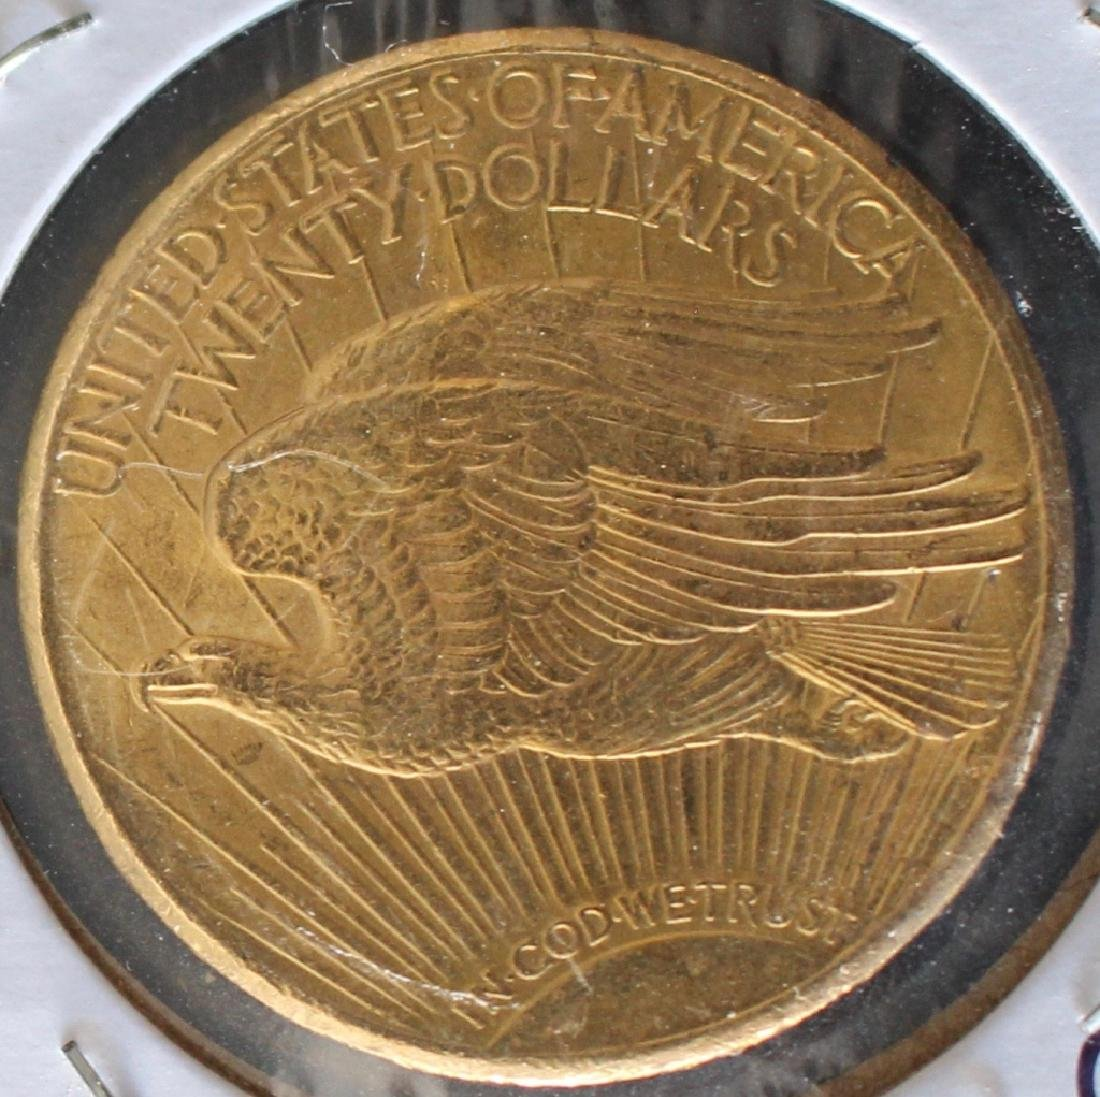 1927 St. Gaudens US $20 Gold Coin - 2